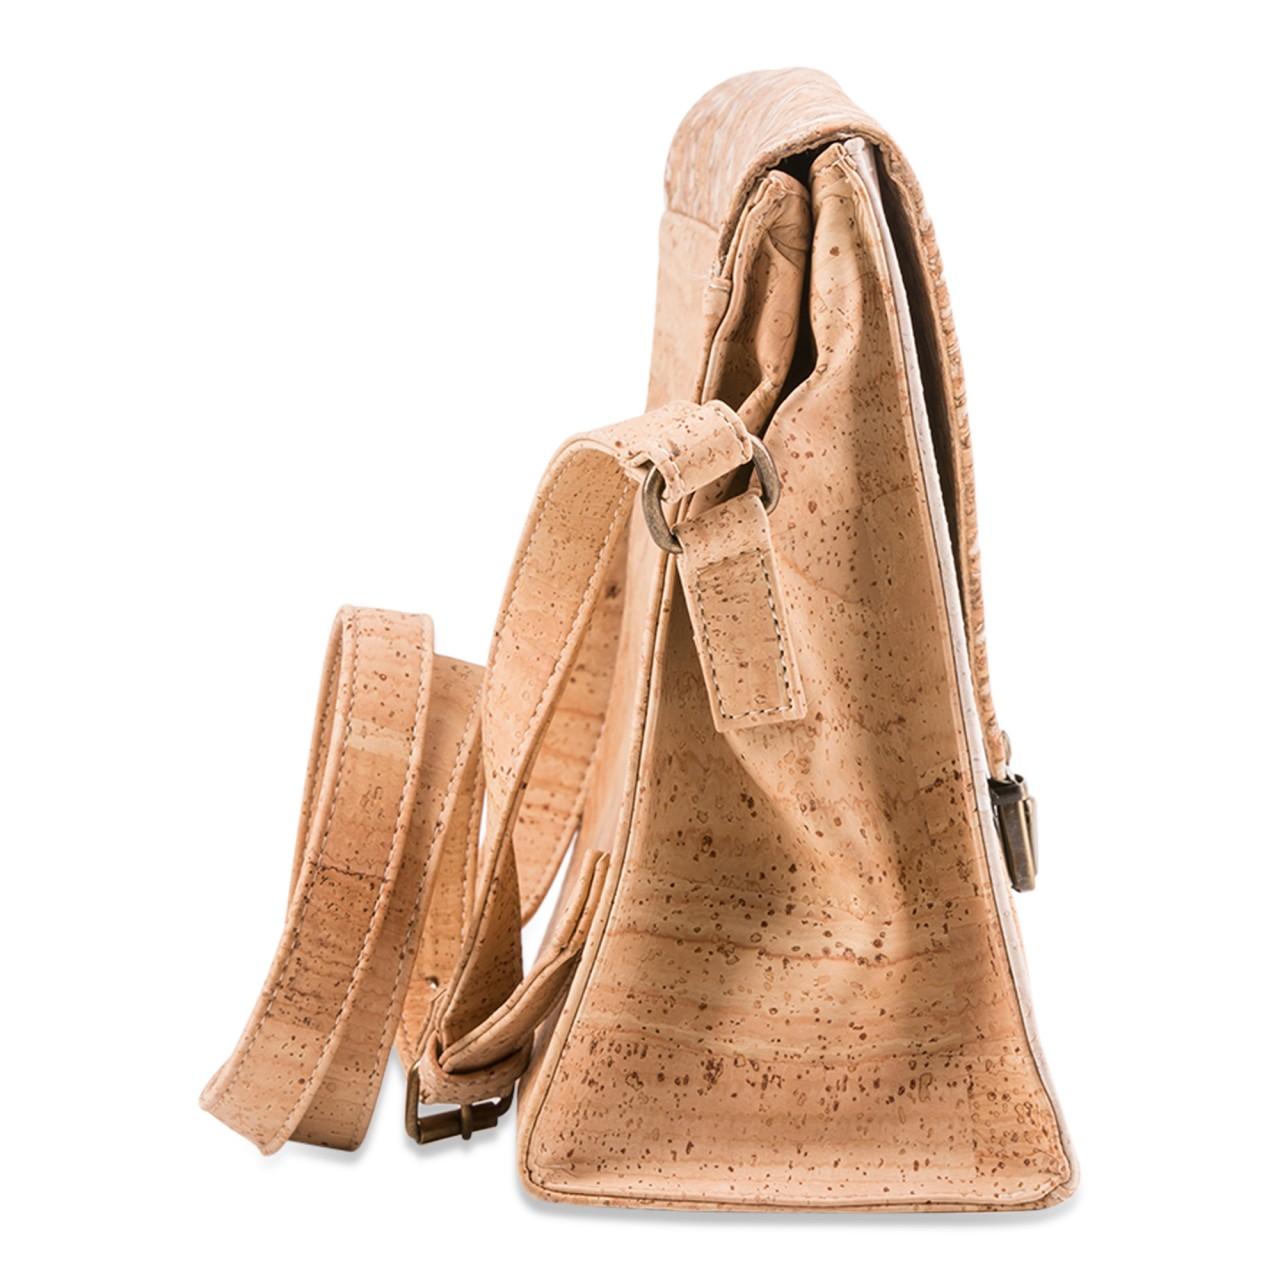 3e96563ba59 CORK TRICOLOR ENVELOPE SLING BAG (BEIGE/WHITE/FENNEL COPPER)